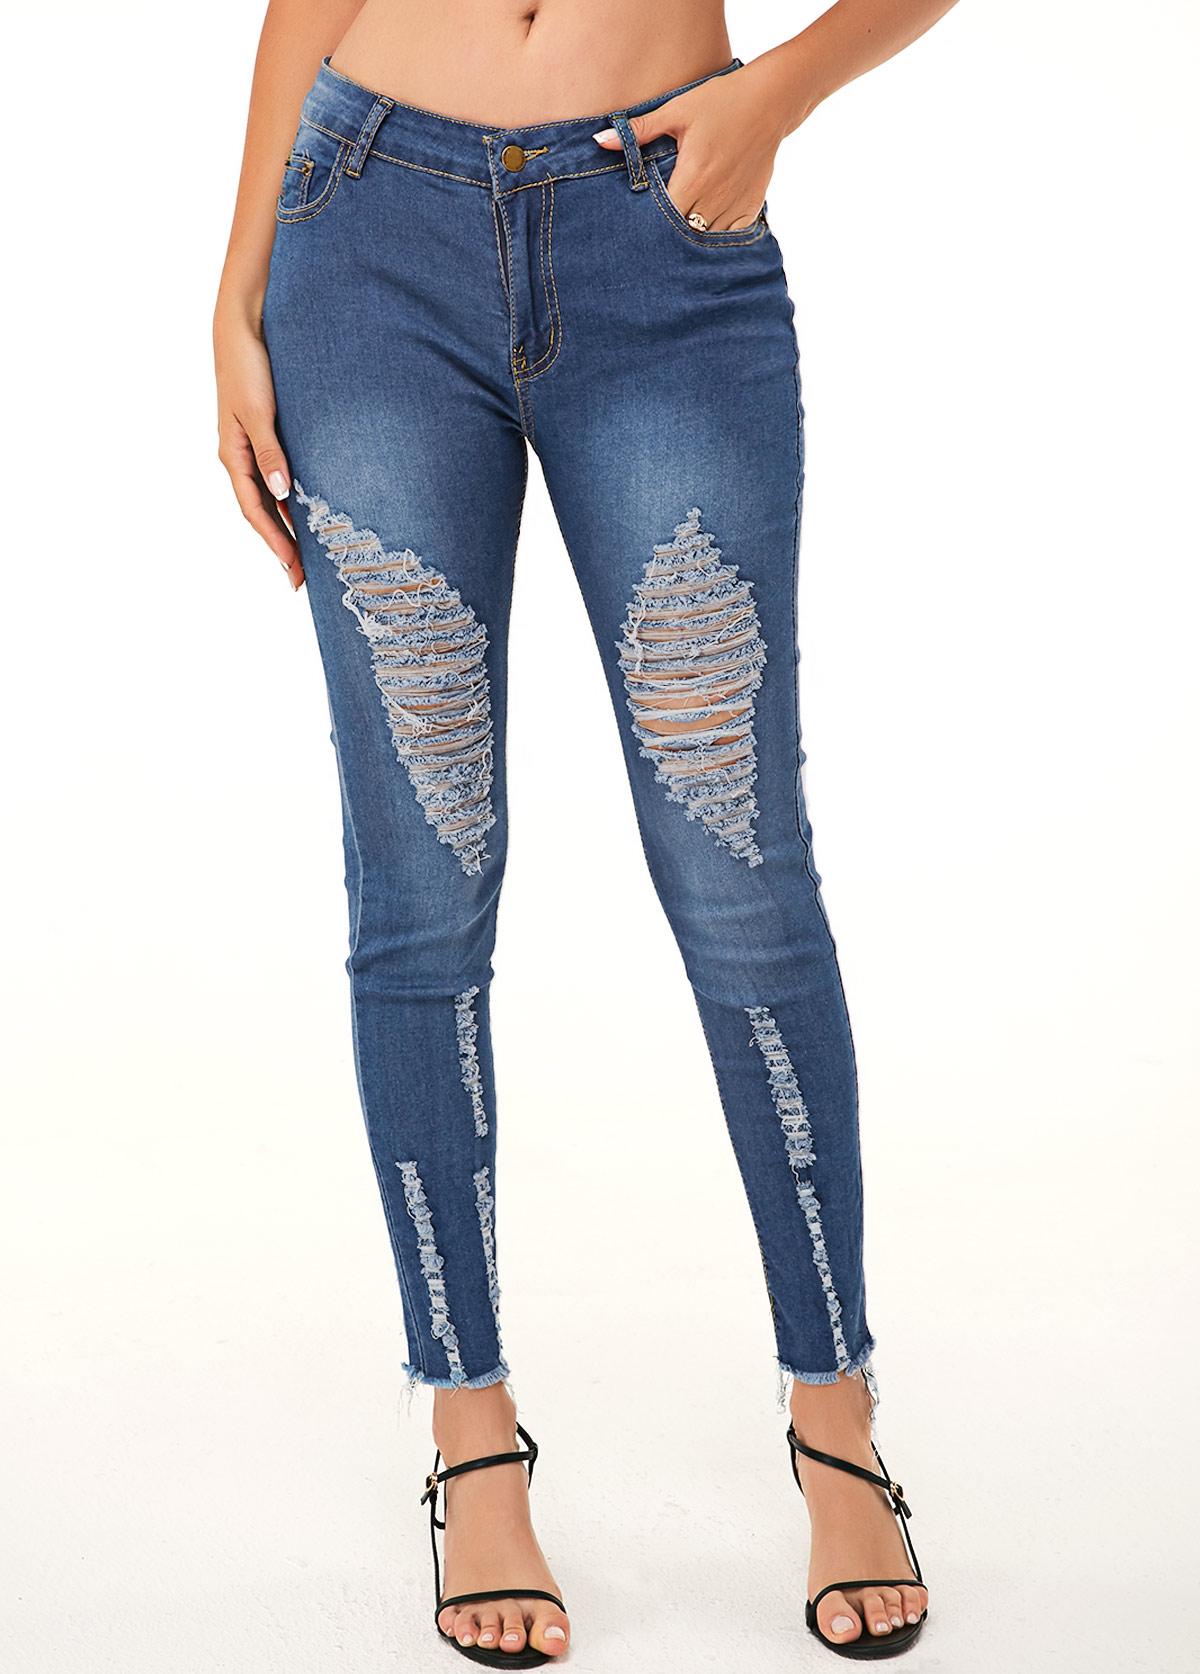 ROTITA Shredded Acid Washed Pocket Skinny Jeans